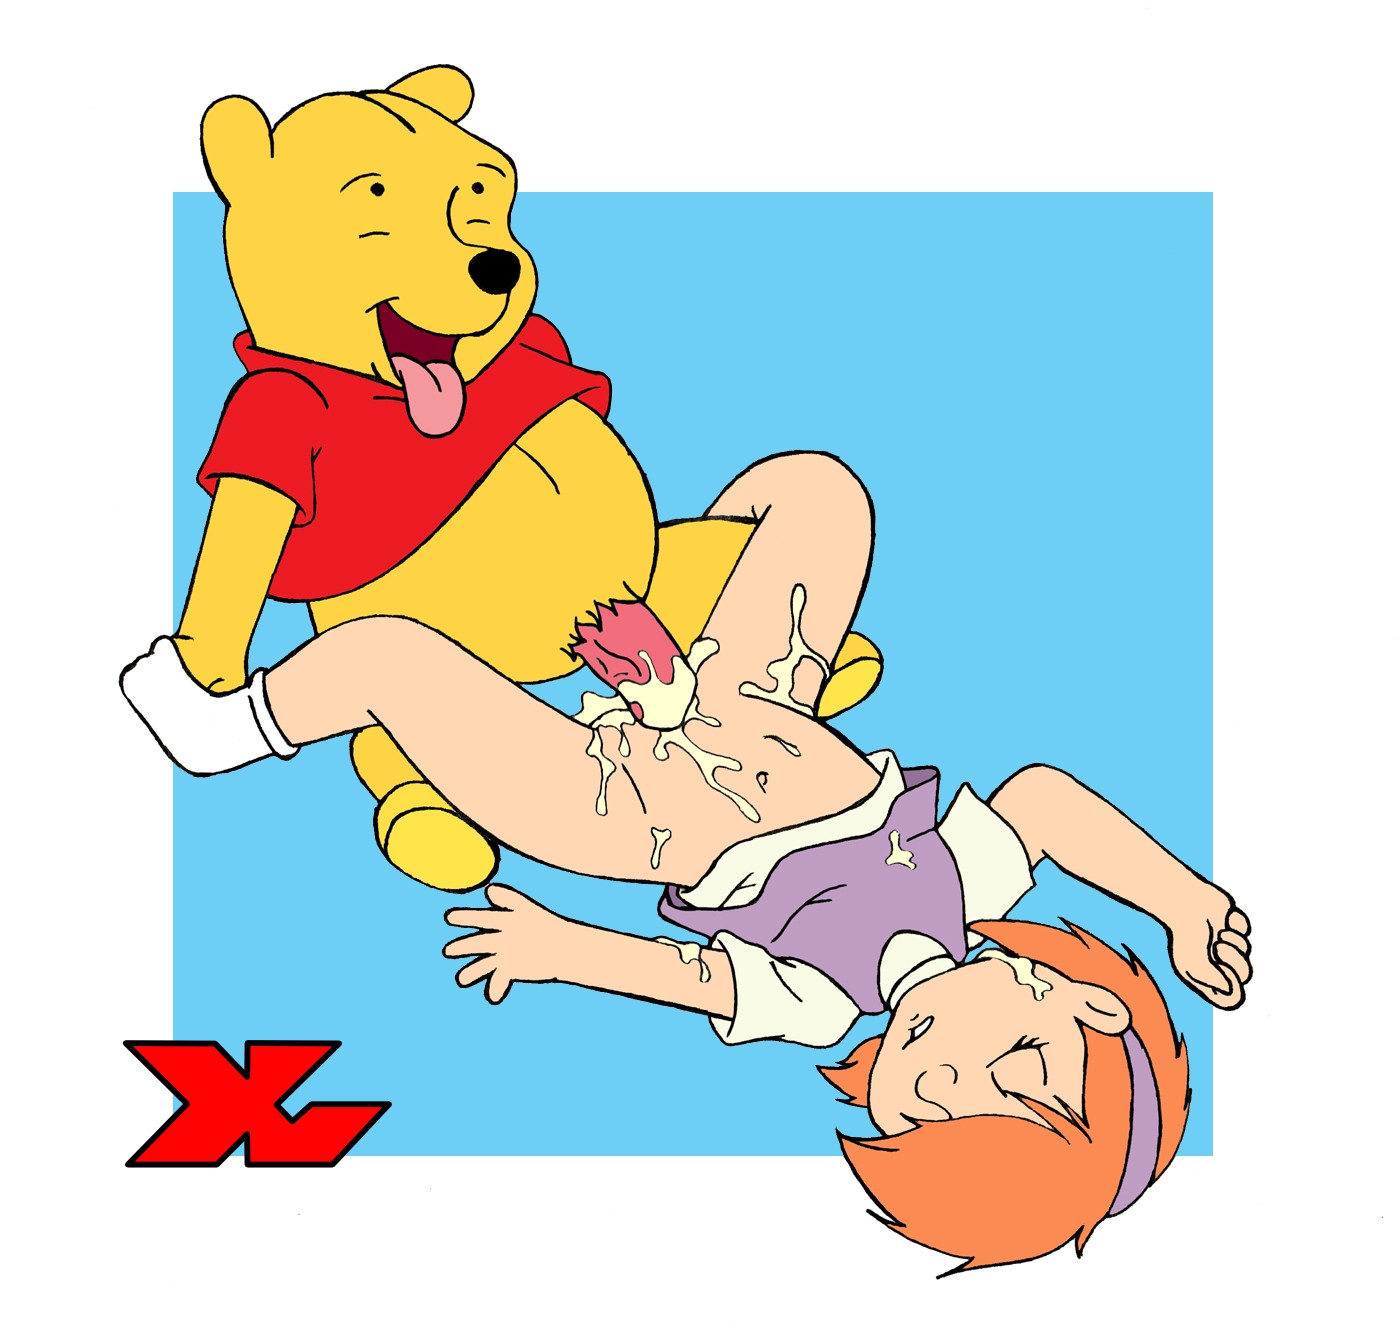 Hope pooh bear cartoon sex emo girl hot